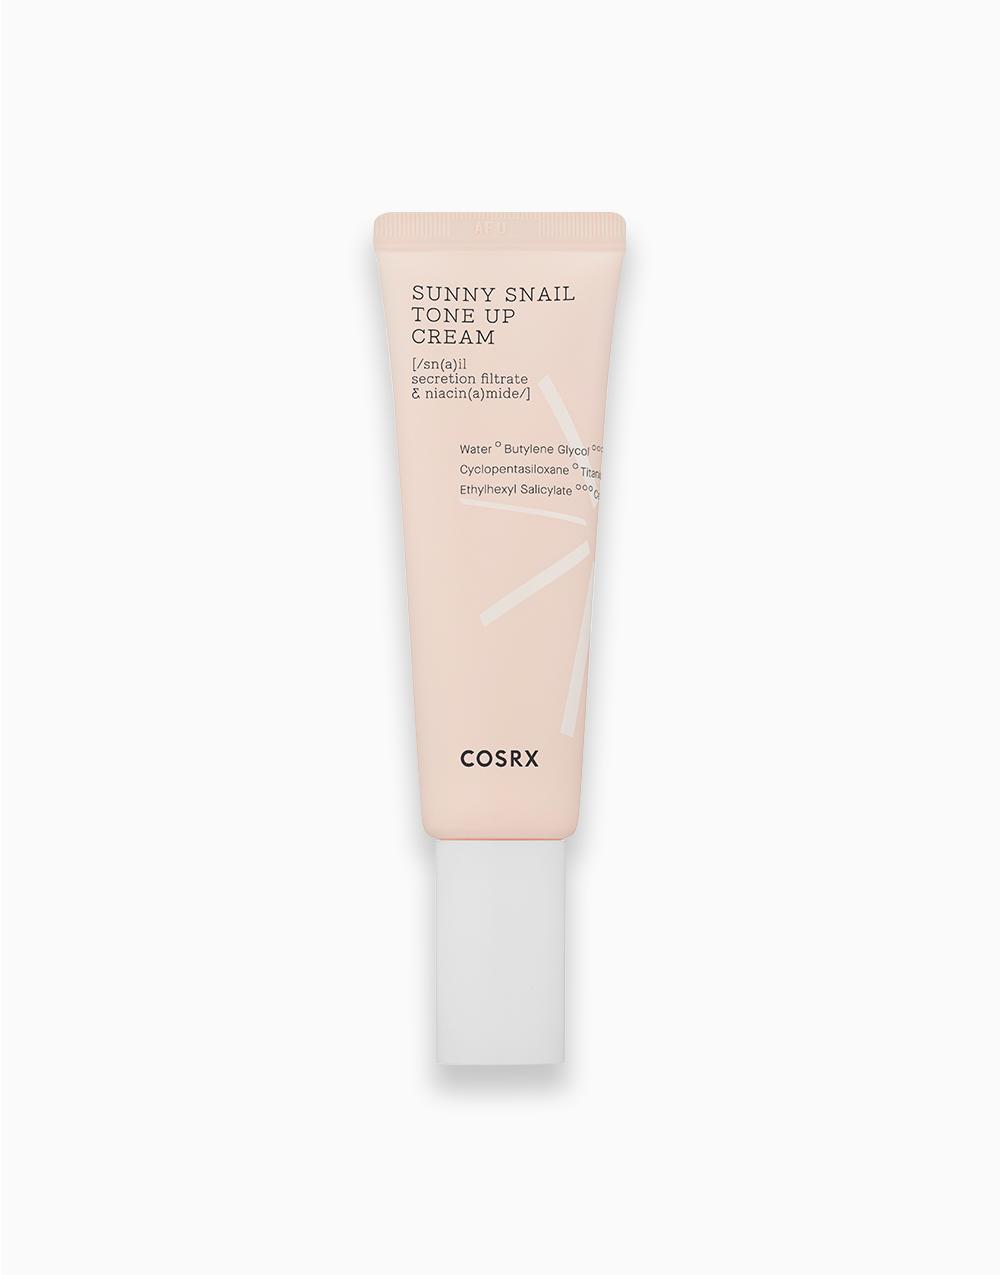 Sunny Snail Tone Up Cream by COSRX